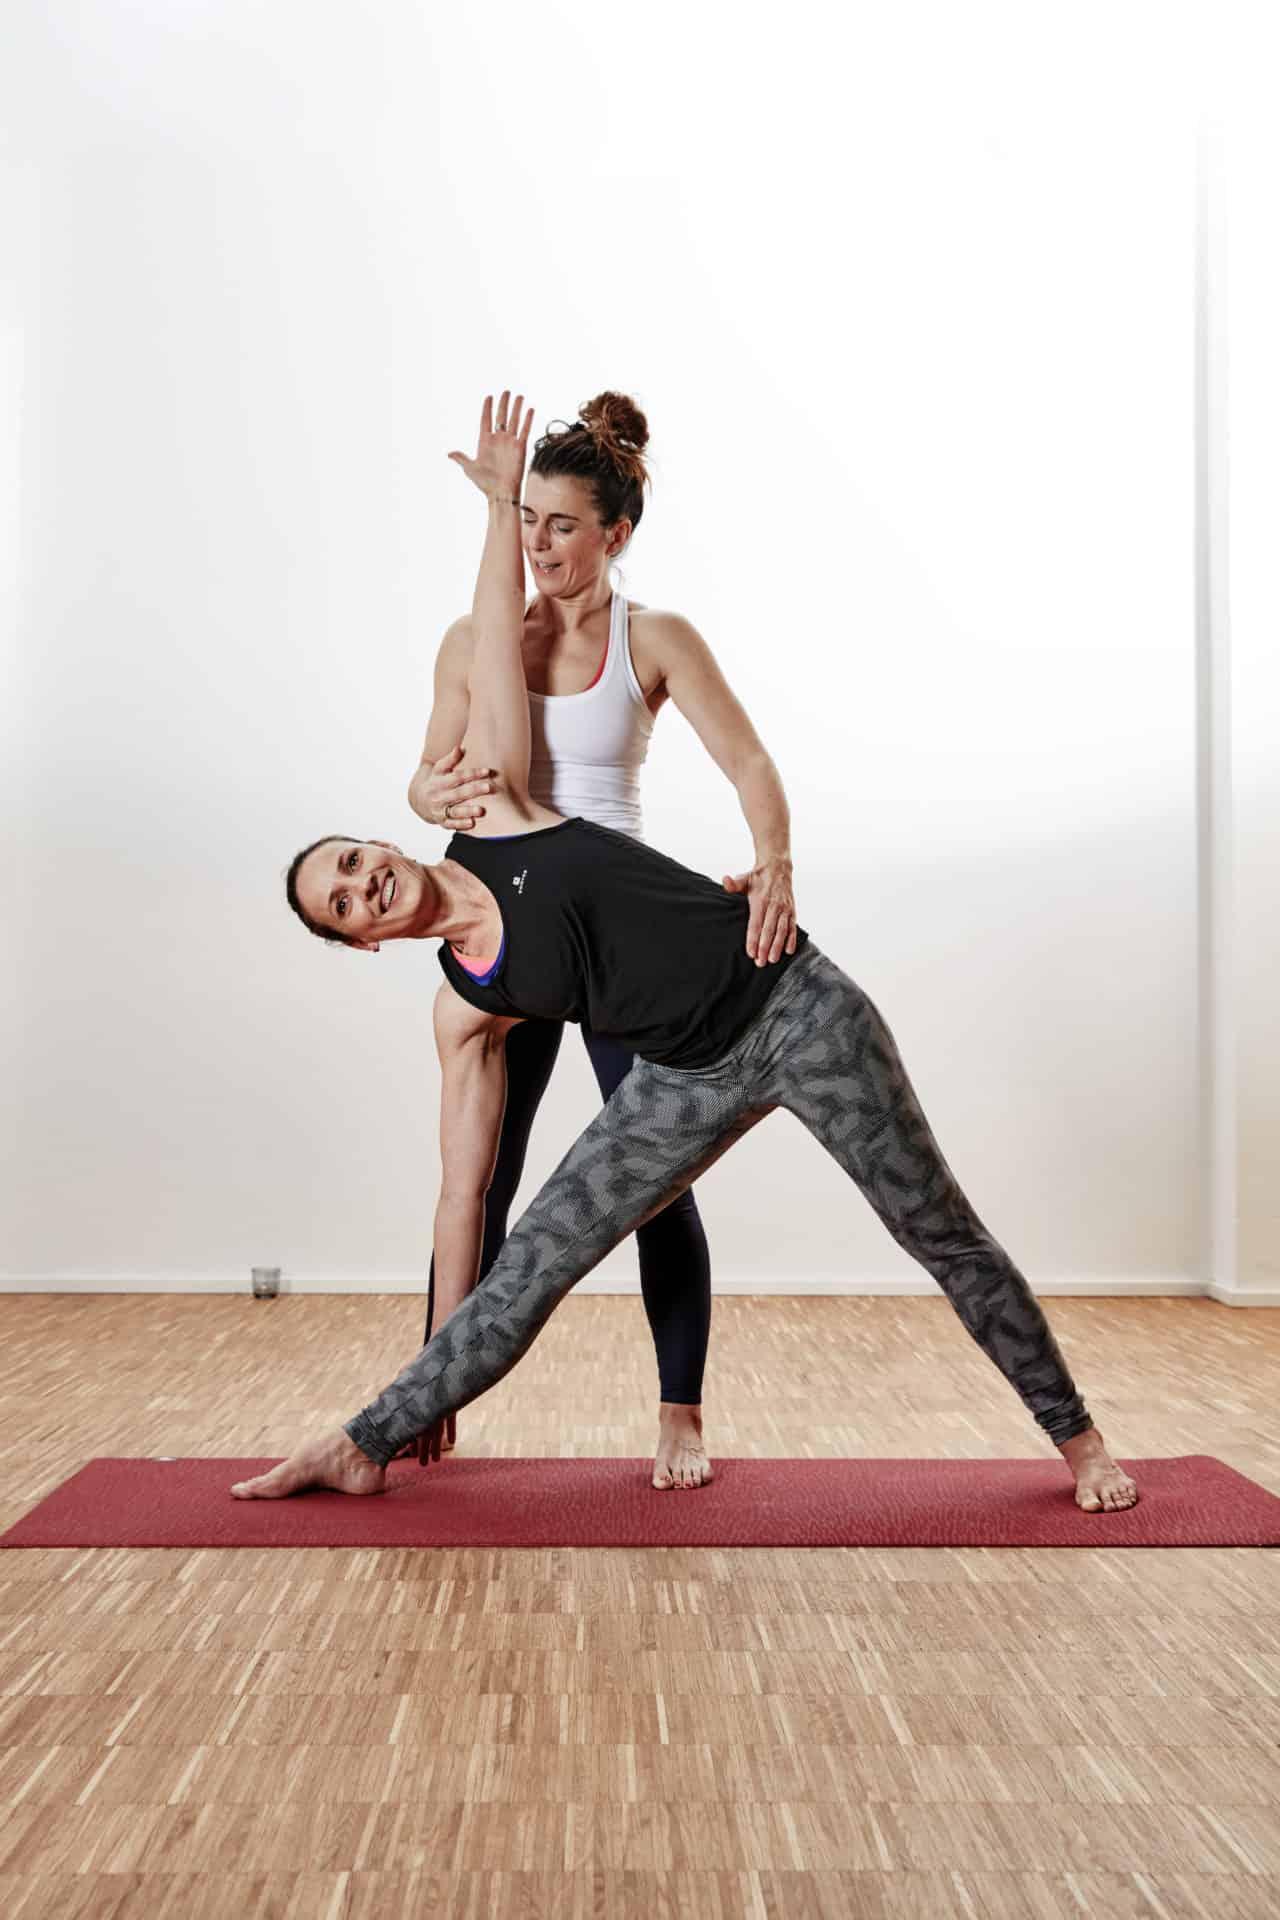 YogaManufaktur_Wuerzburg_Trikonasana_Dreieck_Yogalehrer_Adjustment_Hands_on_4